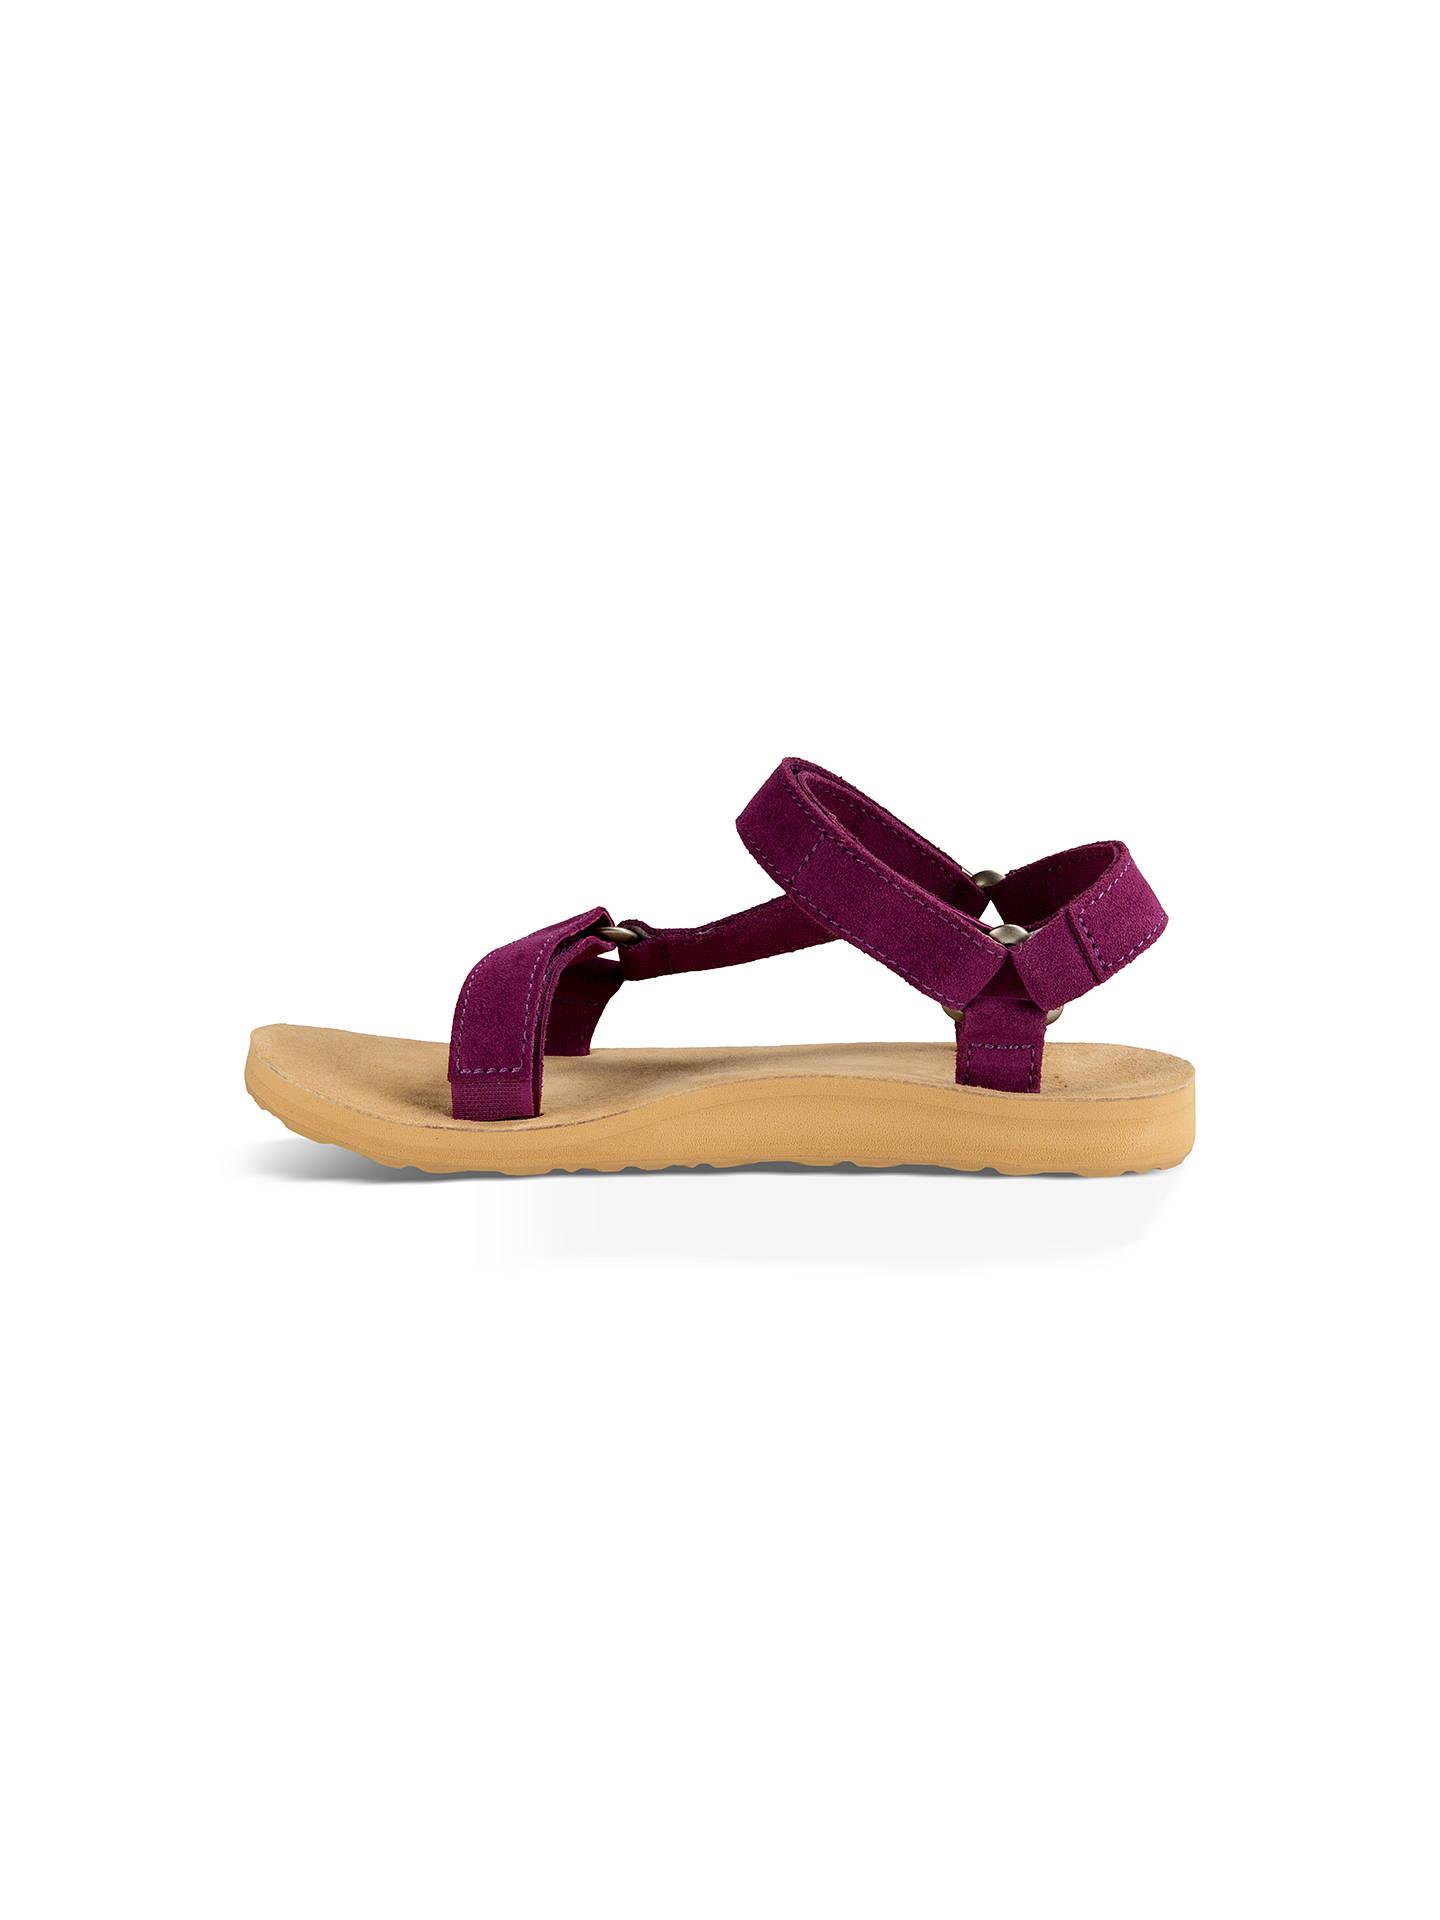 97c8e5ddb9bb ... Buy Teva Original Universal Suede Women s Sandals